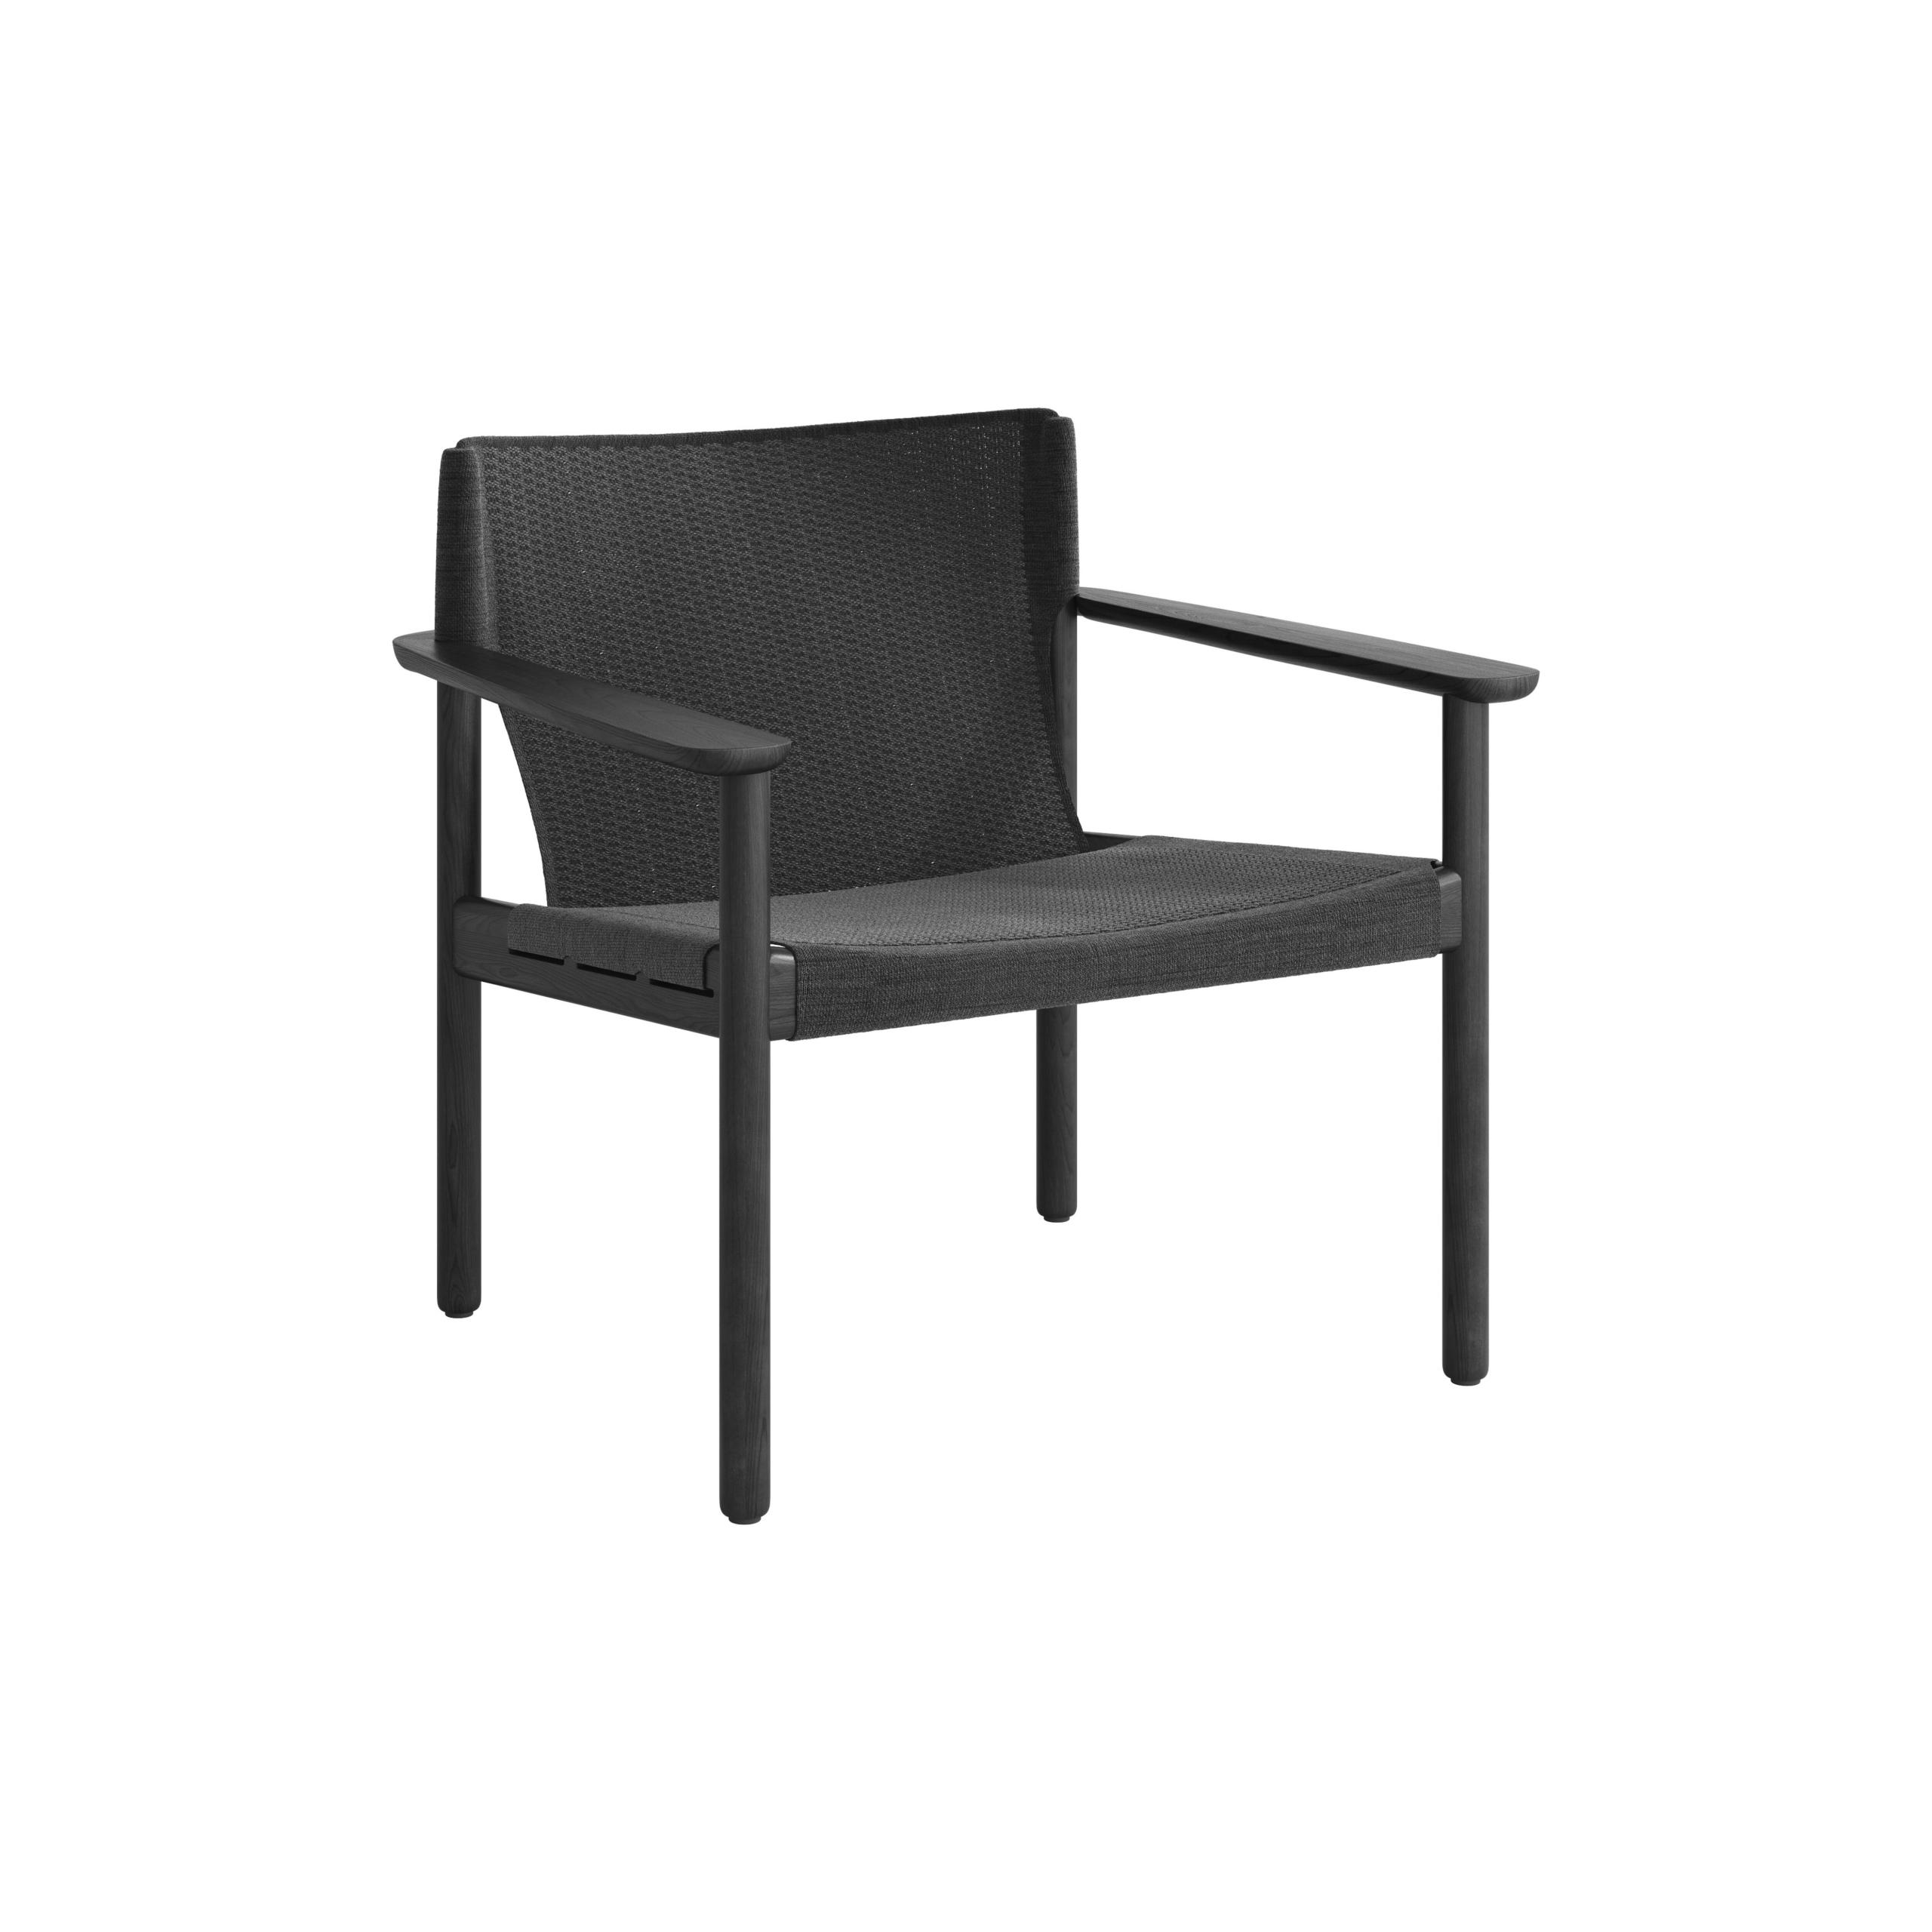 Evo Lounge chair product image 5